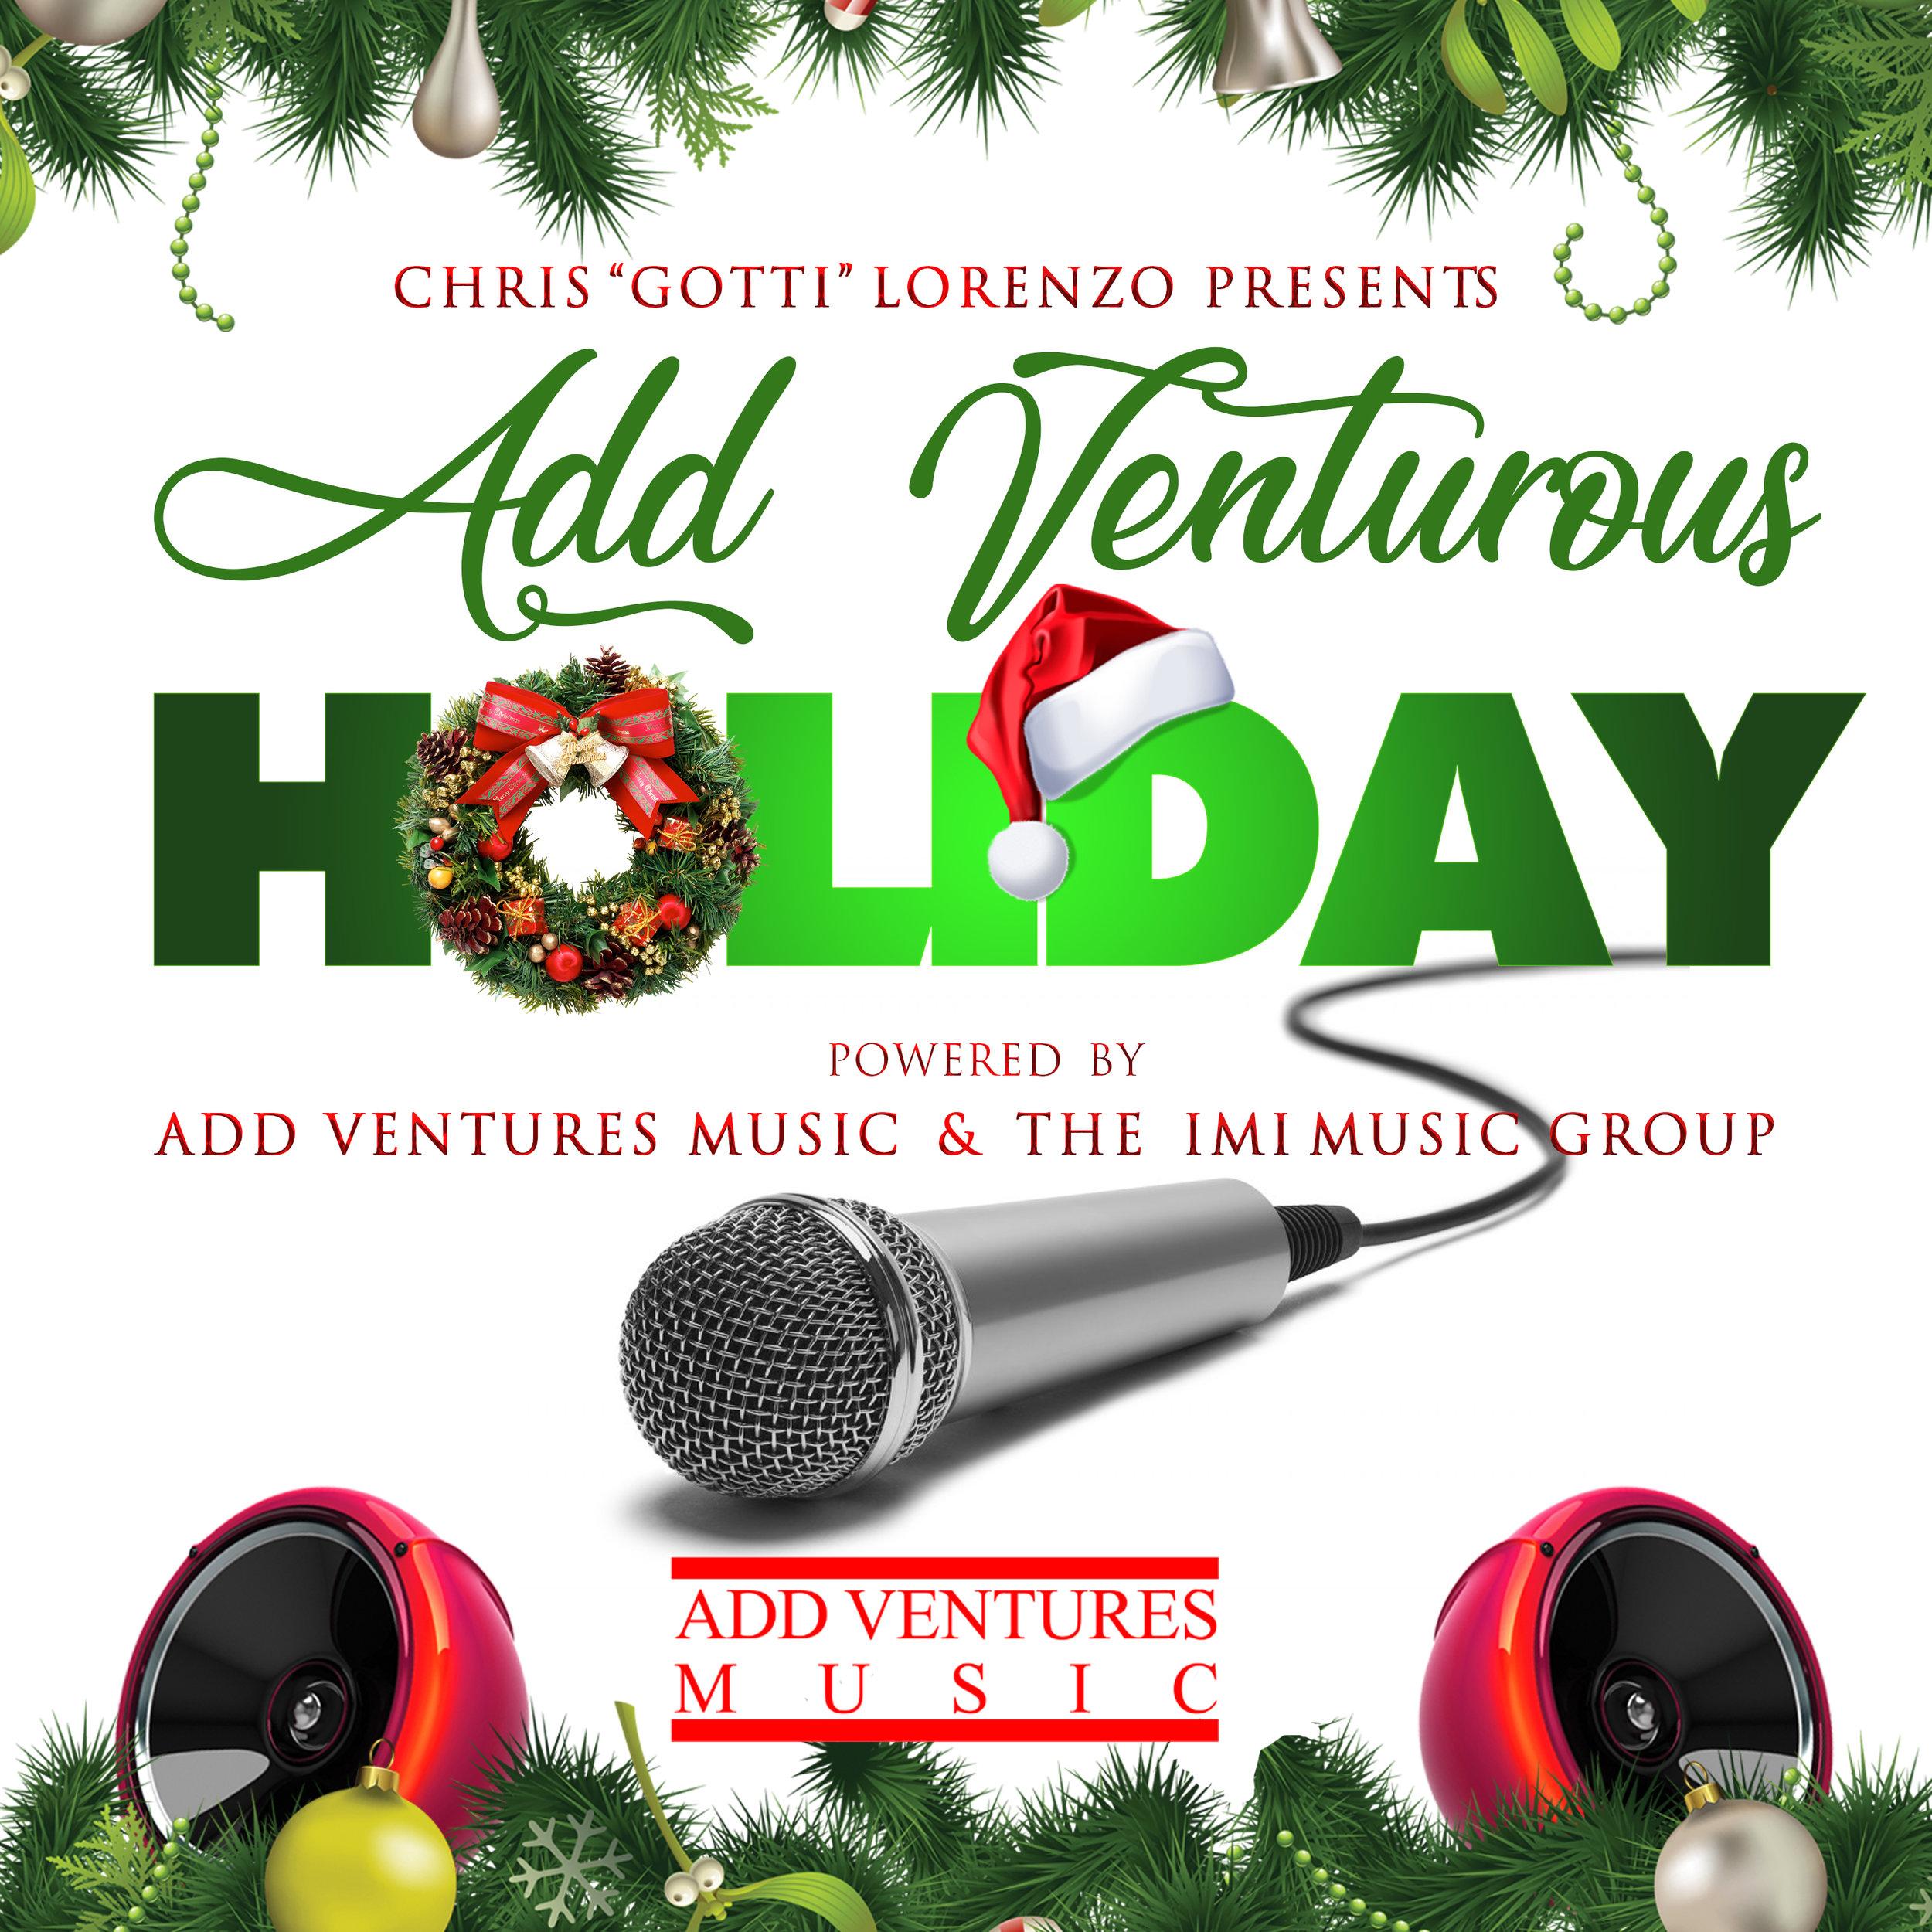 CG - Add Venturous Holiday Clean Final.jpg